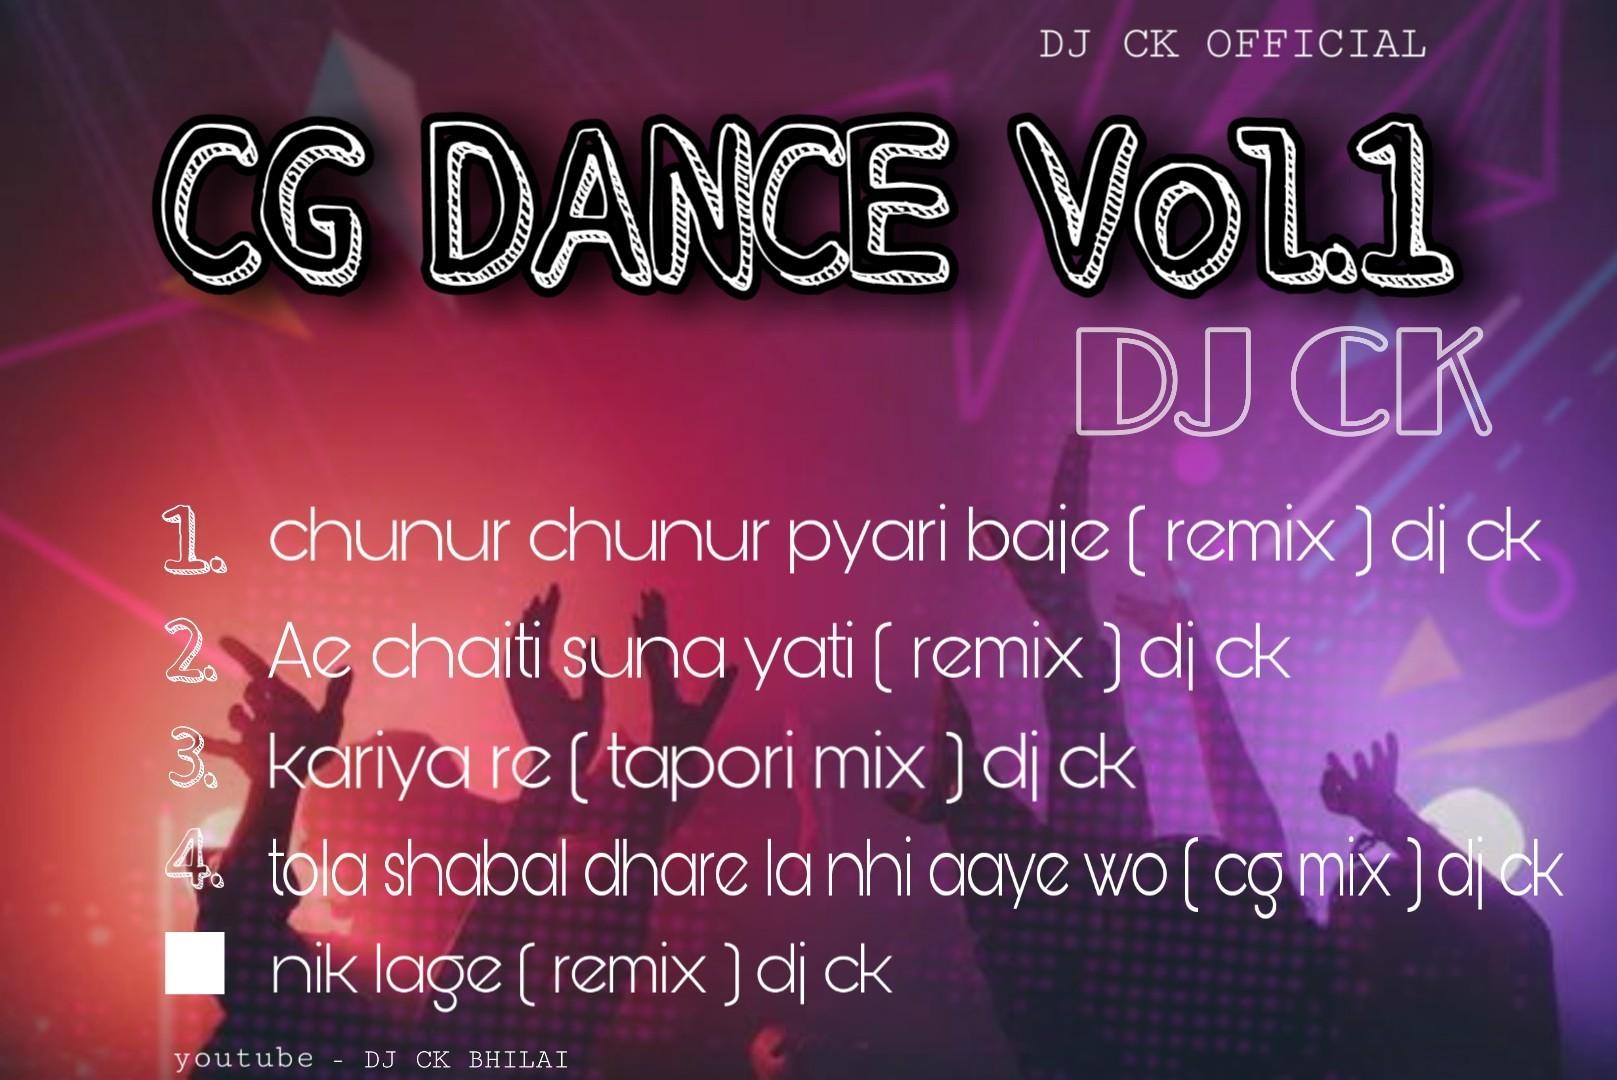 Chhattisgarhi Dance Vol.1 Dj Ck Official Present's